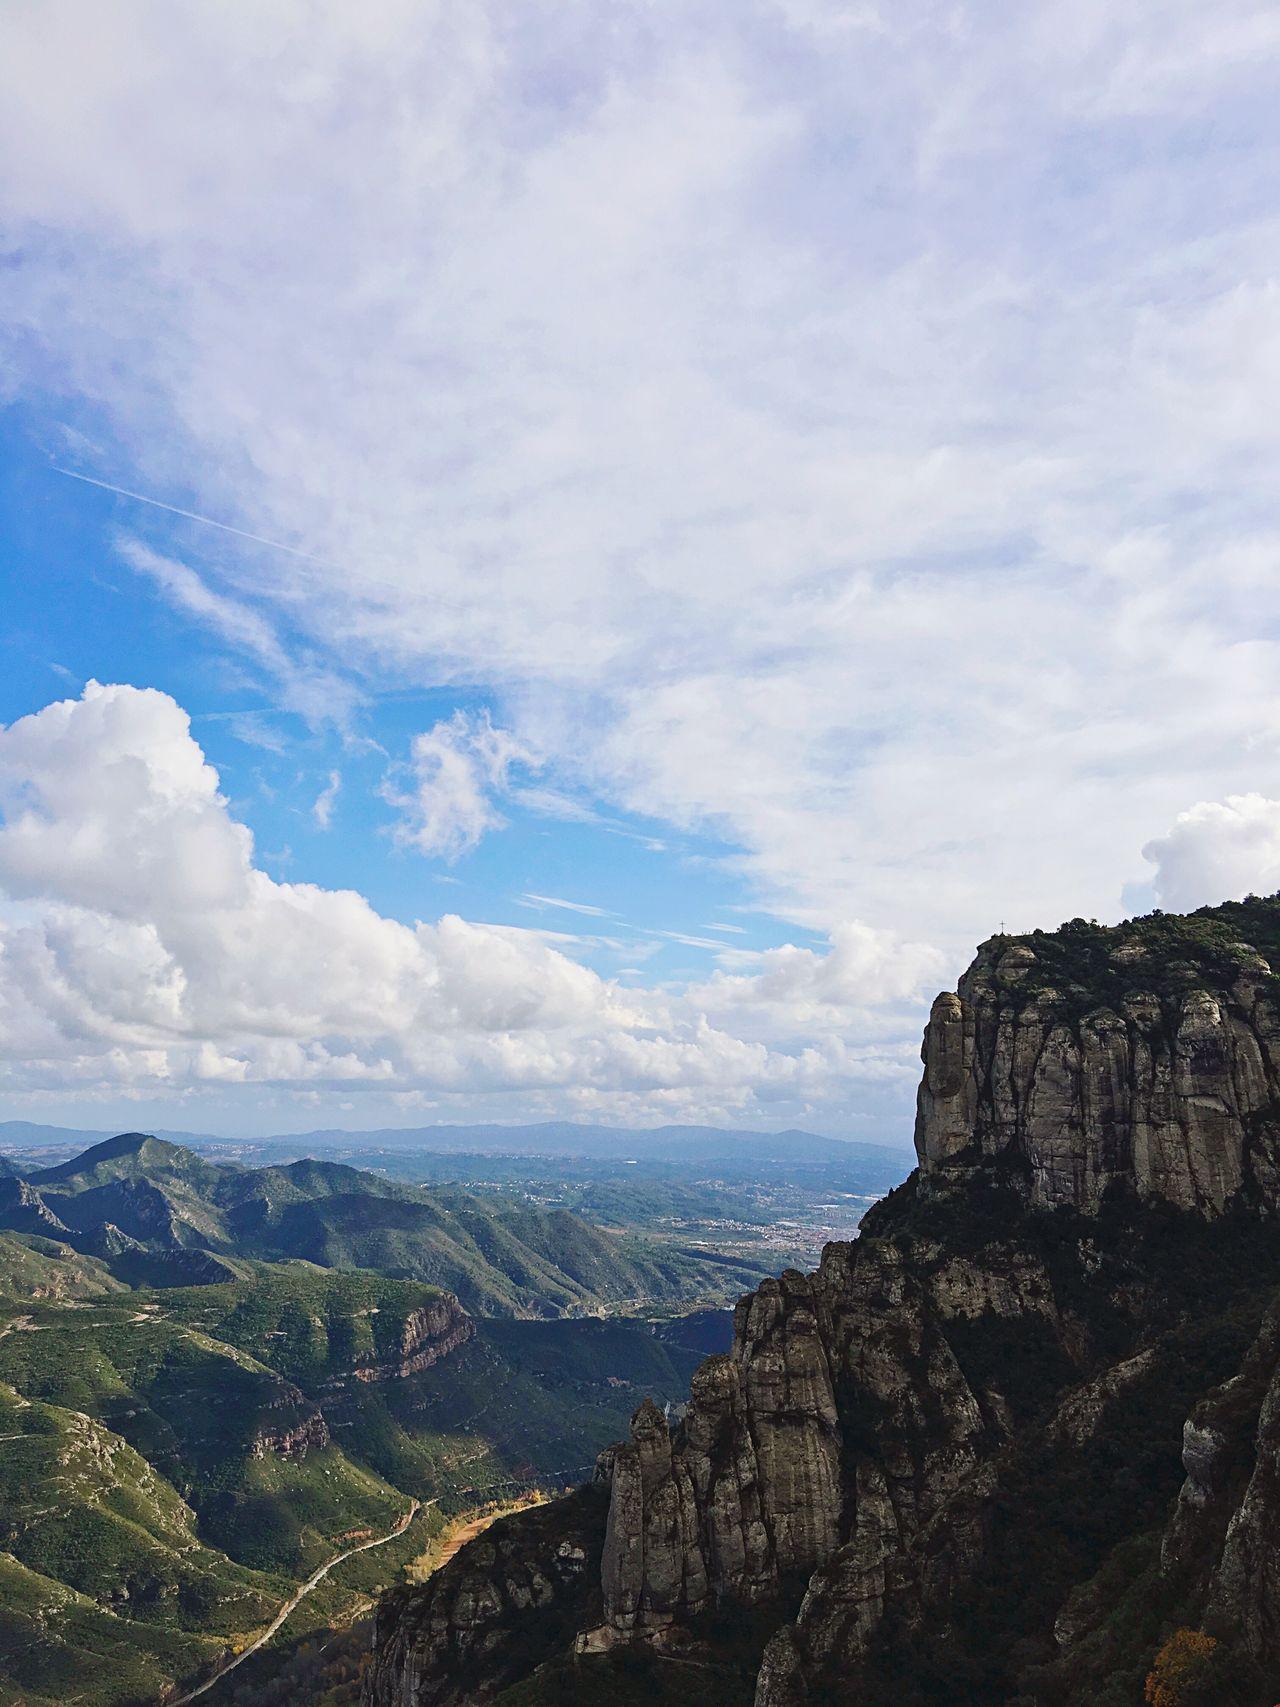 Sky Landscape Nature Mountain Scenics Beauty In Nature Day Outdoors EyeEm ShotOnIphone IPhoneography Shotoniphone6splus Travel Wanderlust SPAIN España Montserrat Mountain Range Monastery